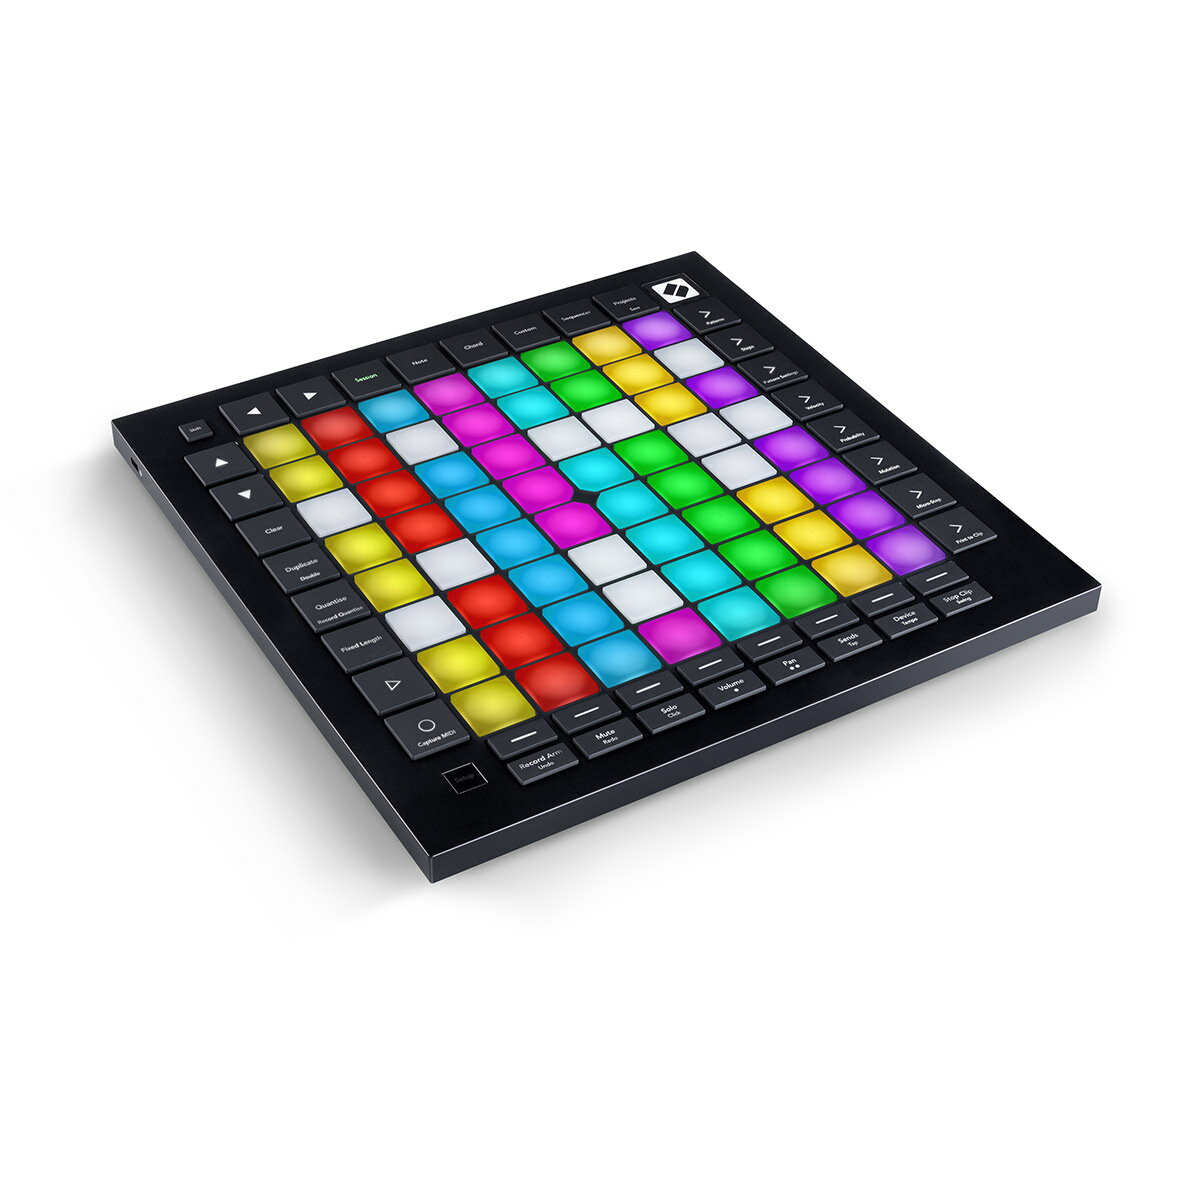 DAW・DTM・レコーダー, MIDIキーボード novation LaunchPad Pro MKIII MIDI